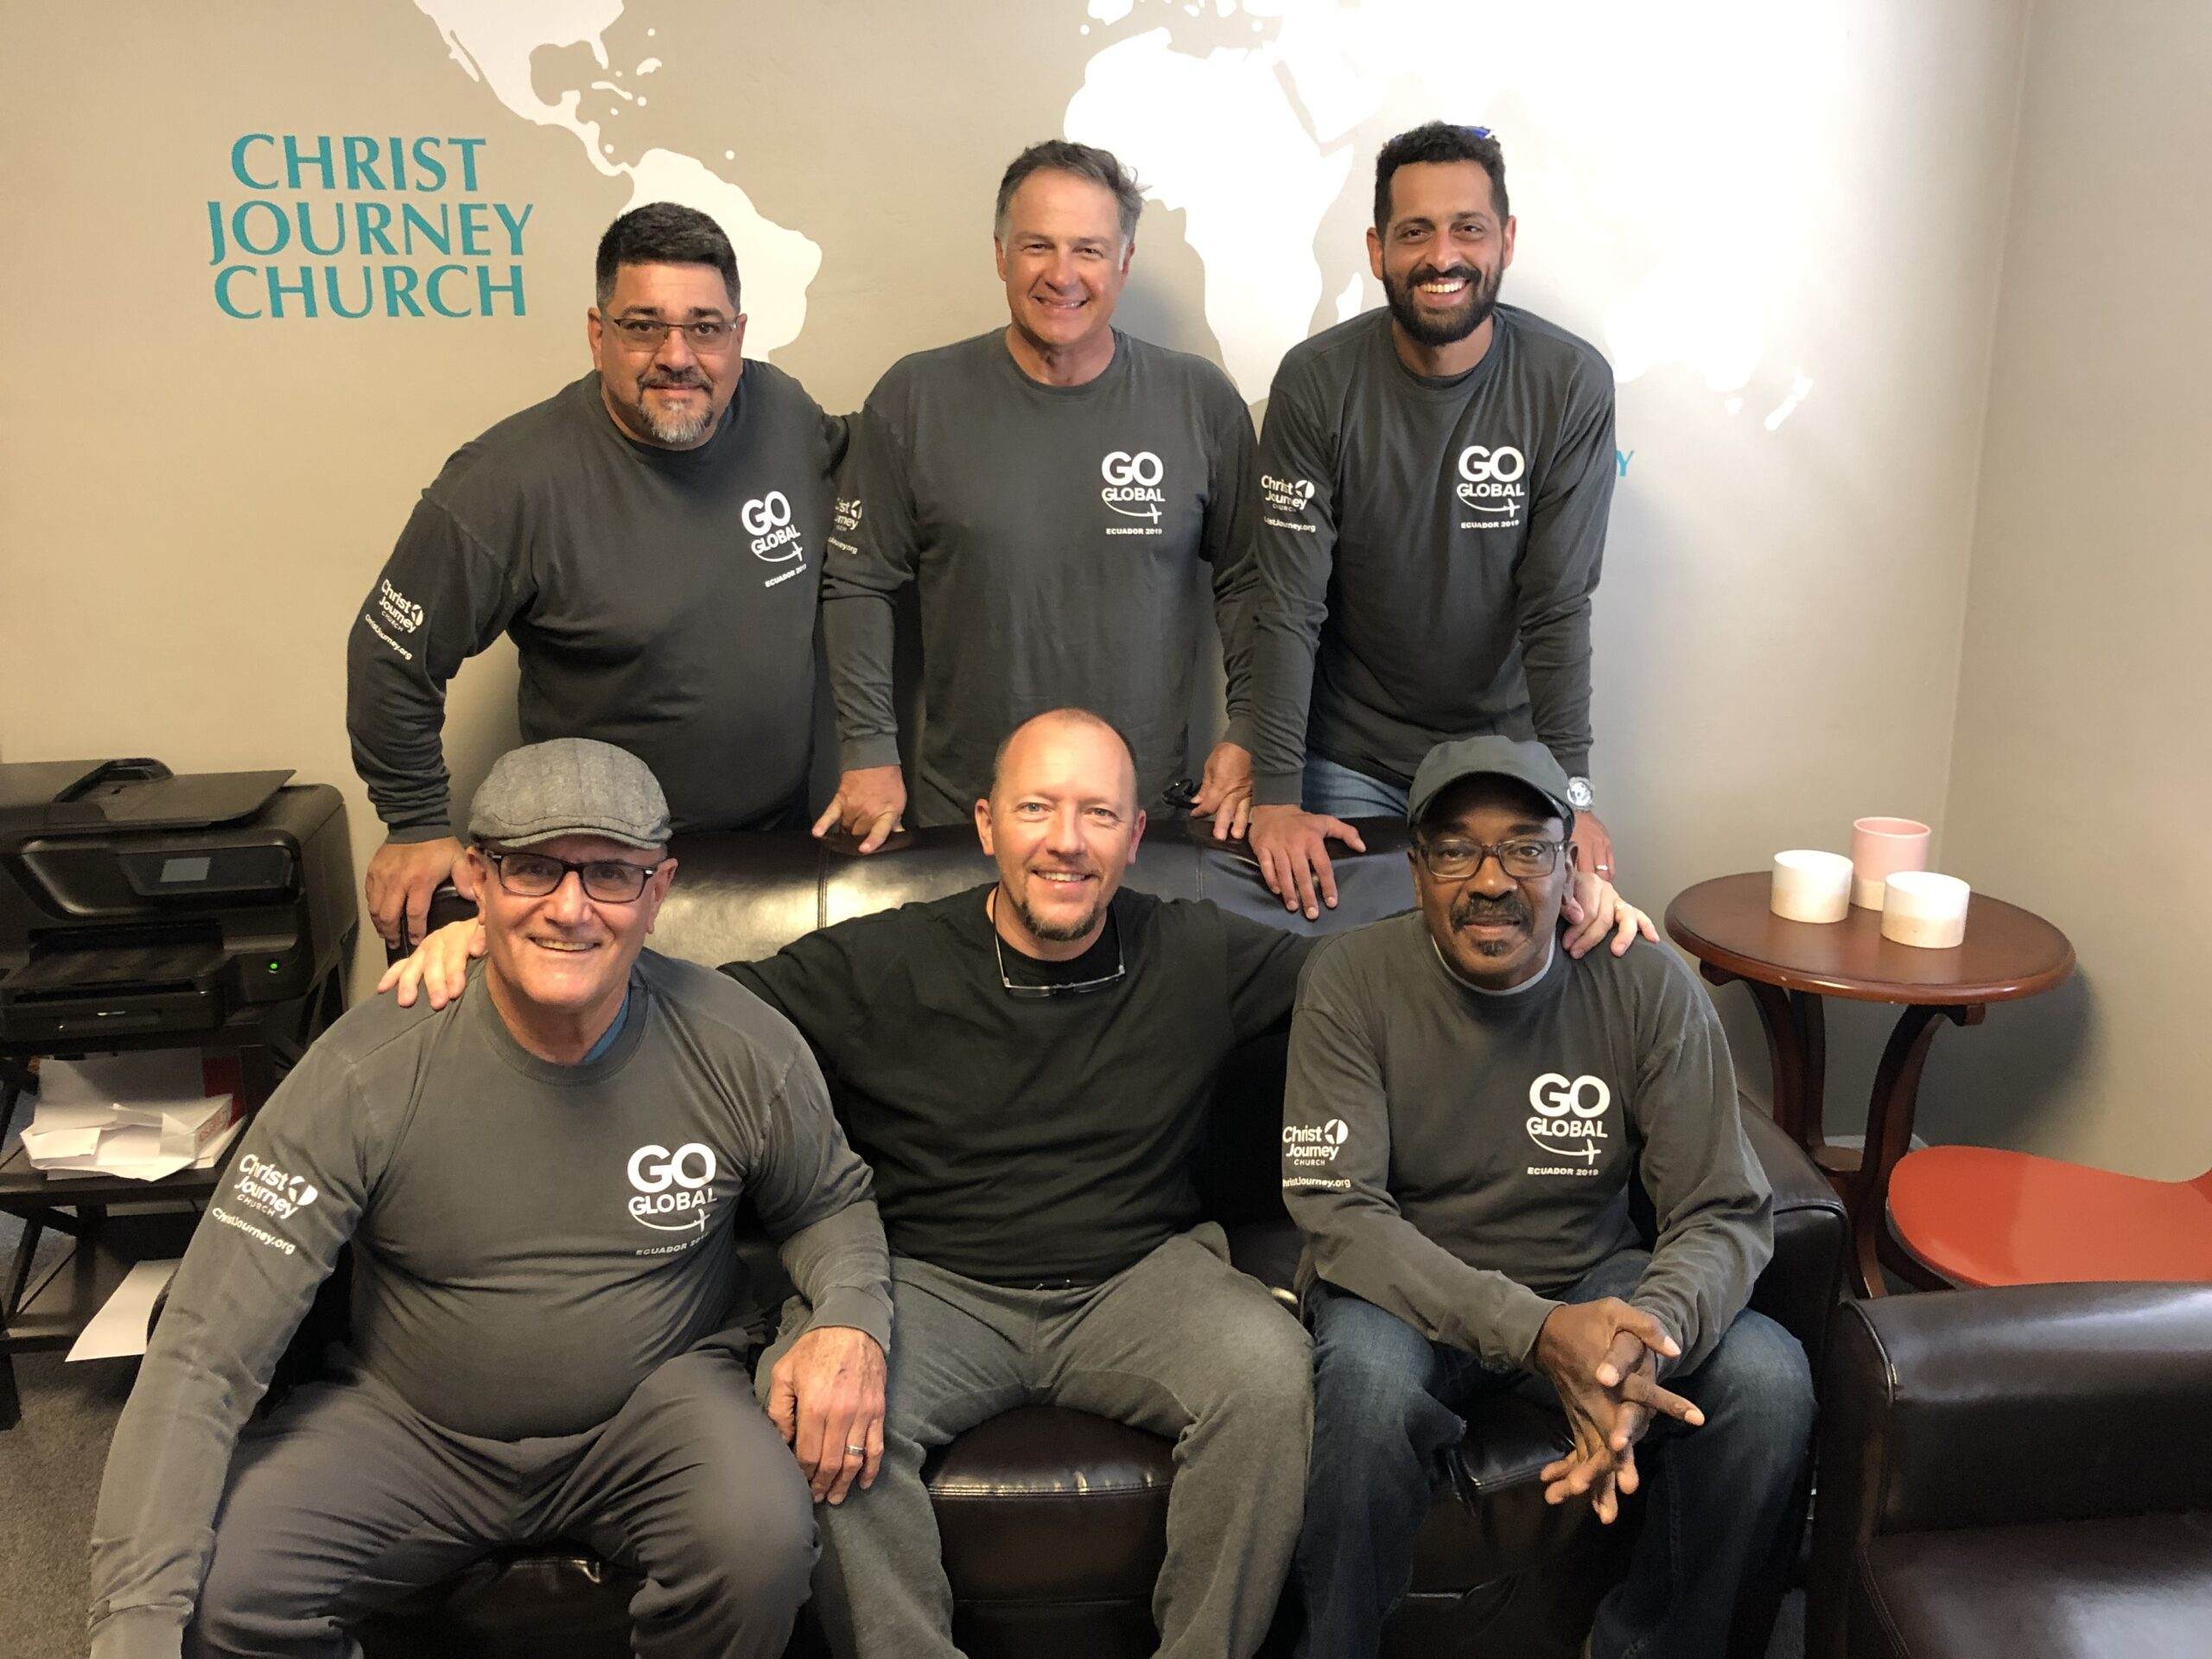 Christ-Journey-Church-Ecuador Men Team at church scaled